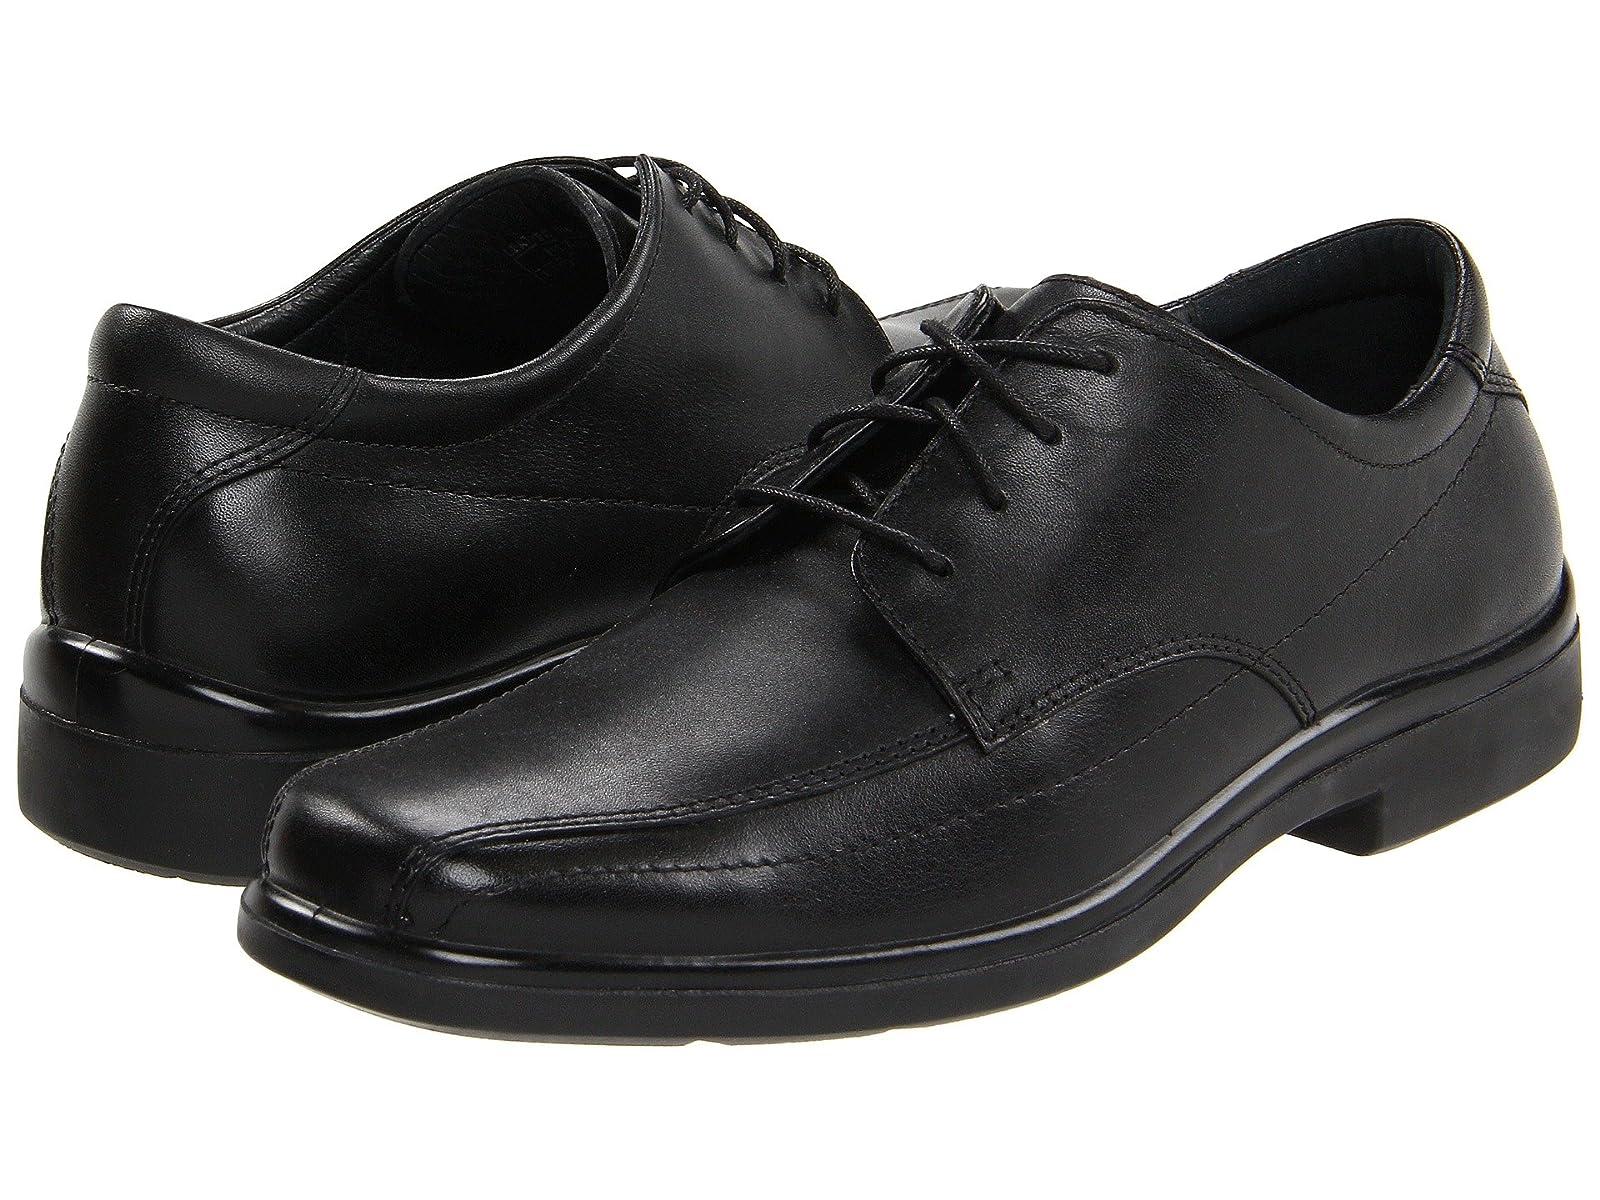 Hush Puppies VentureAtmospheric grades have affordable shoes